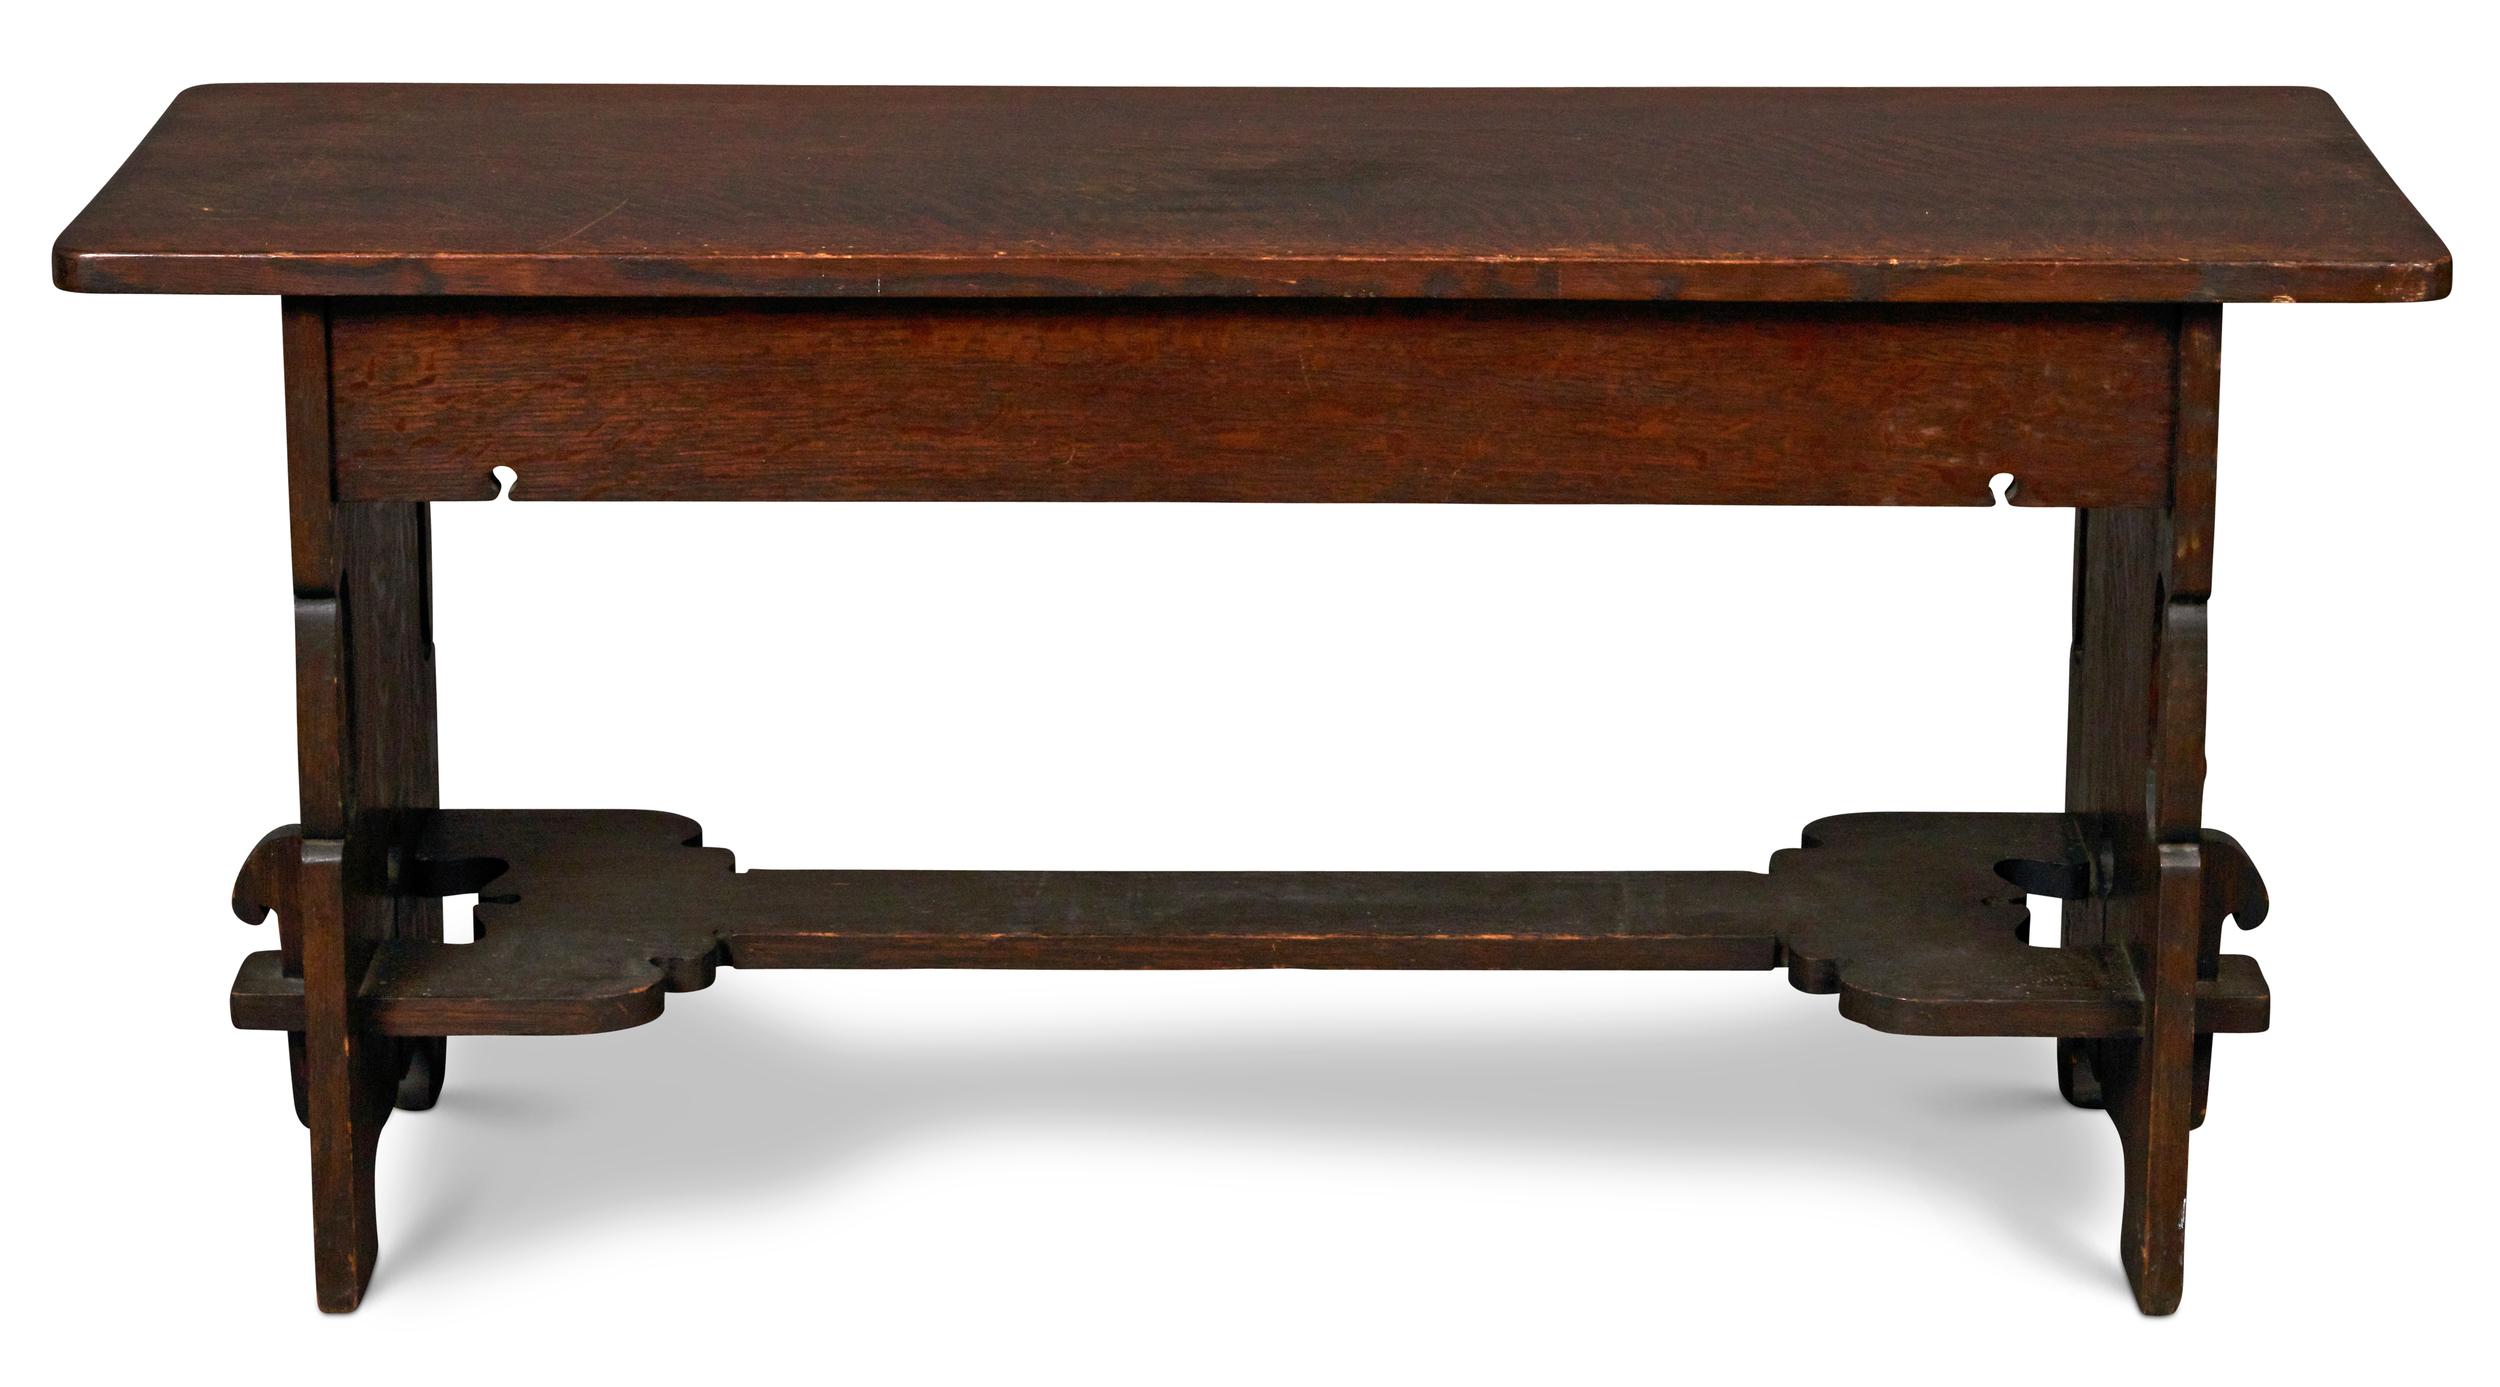 Charles Rohlfs hall bench | Treadway Gallery